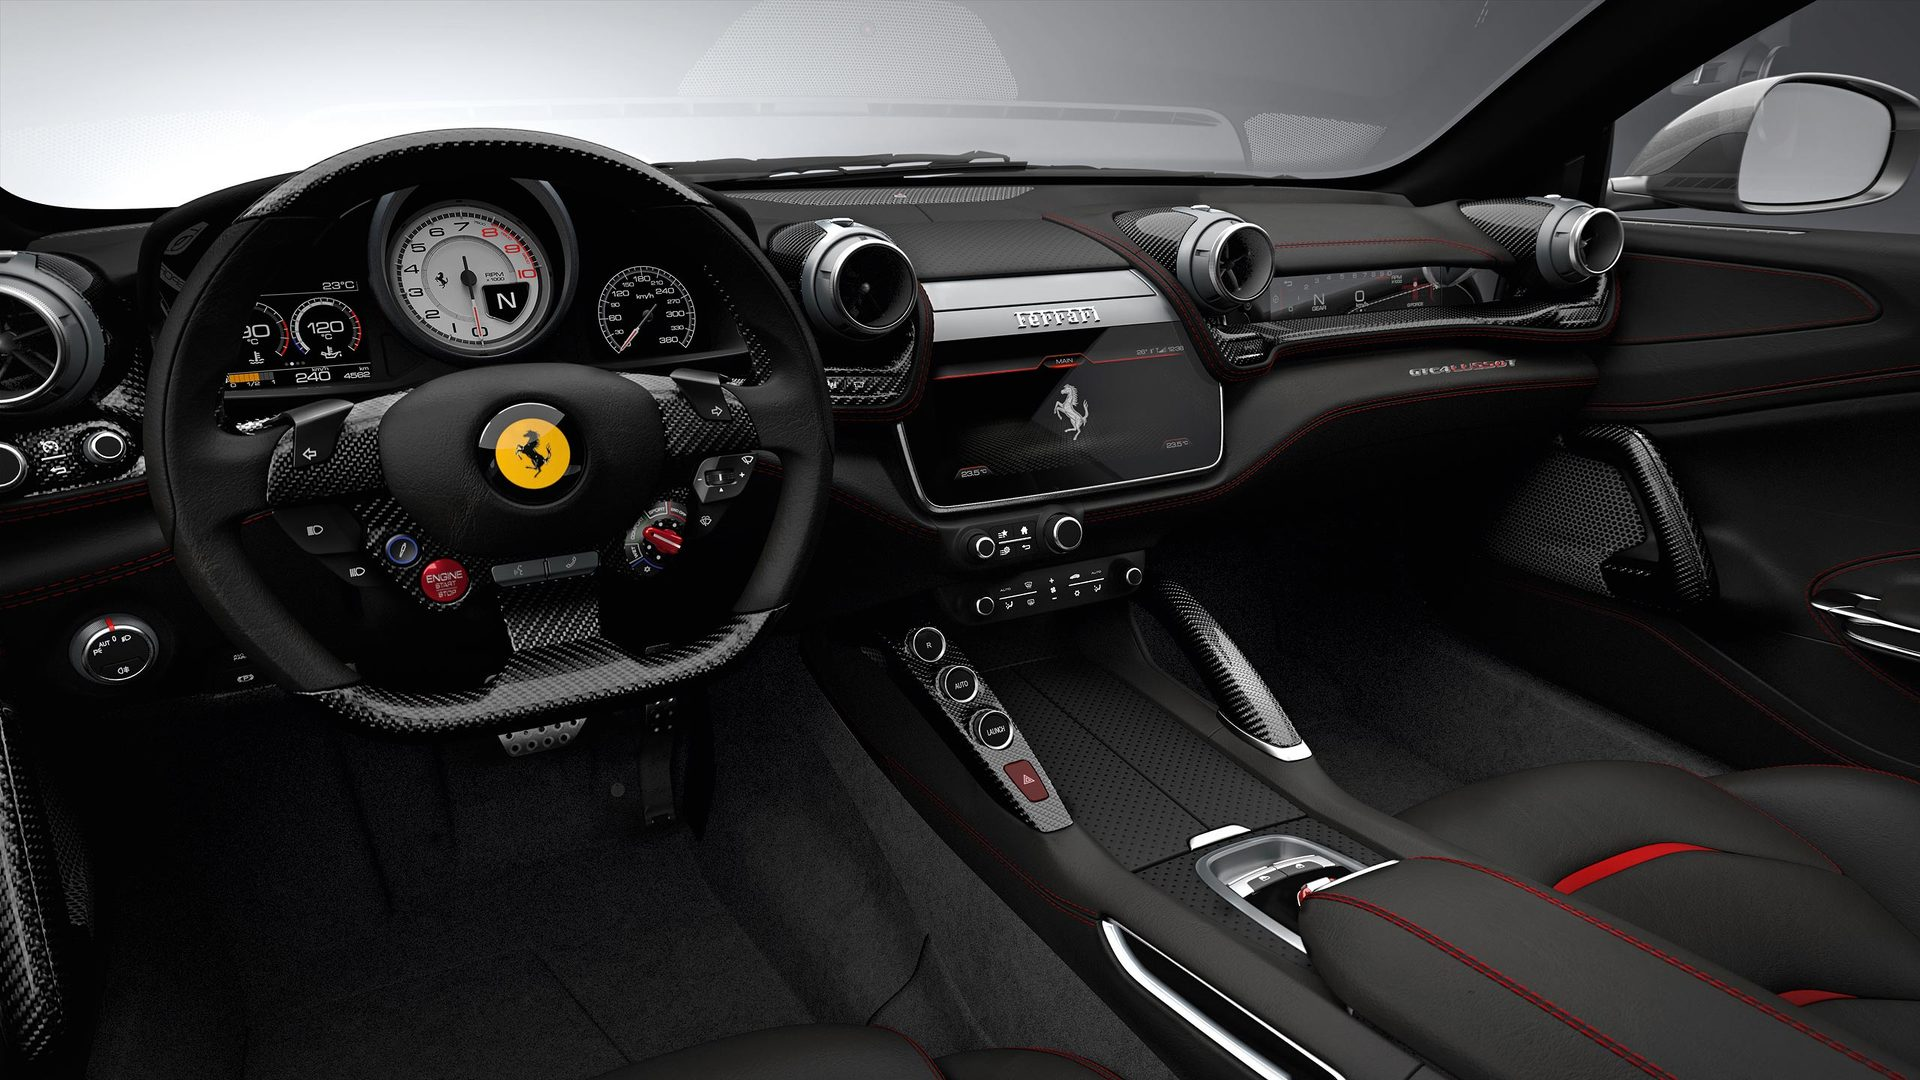 Ferrari отзывает машины из-за риска возгорания и дефекта дверей 2